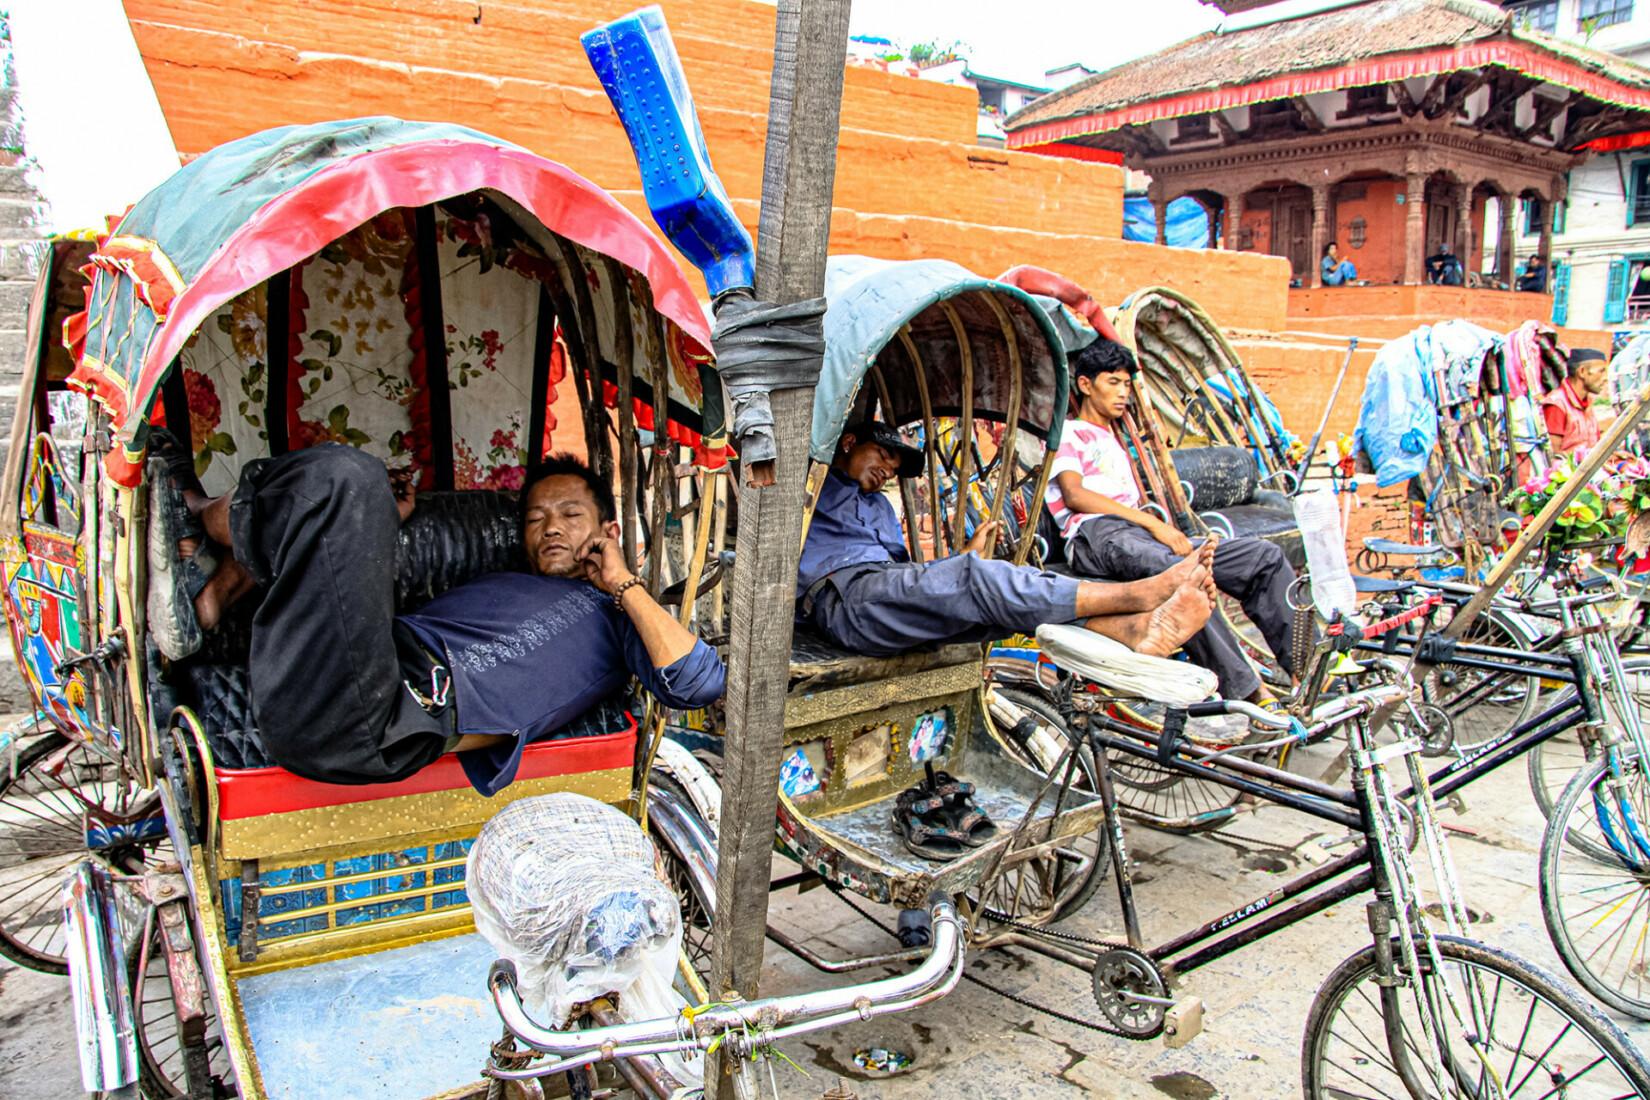 Durbar Square Rikschafahrer